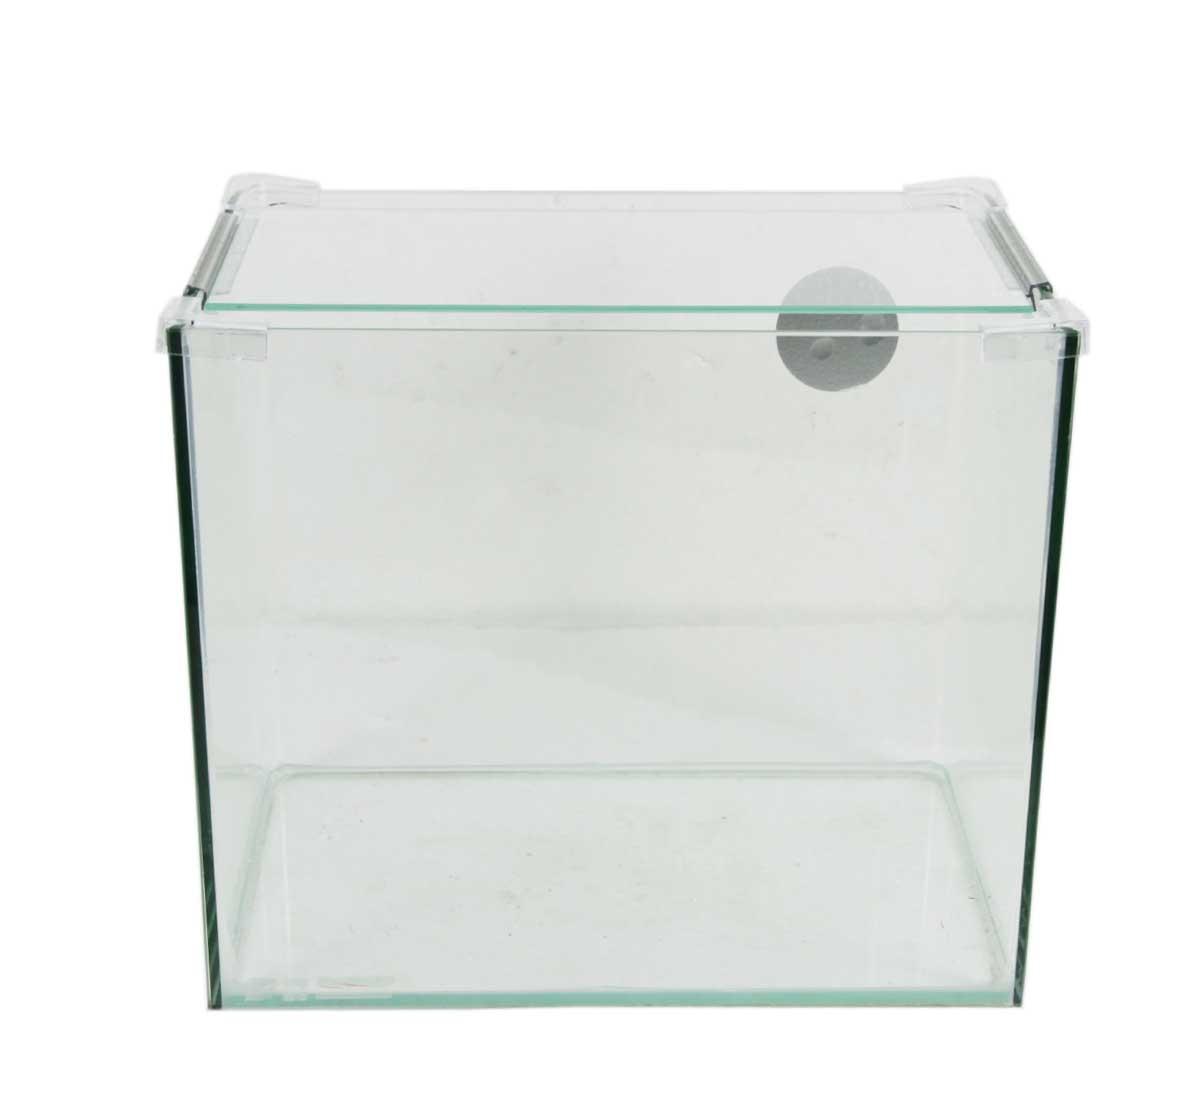 Dolphin Glass Aquarium Small - (LxWxH - 13x8x11 Inch) Aquariums ...